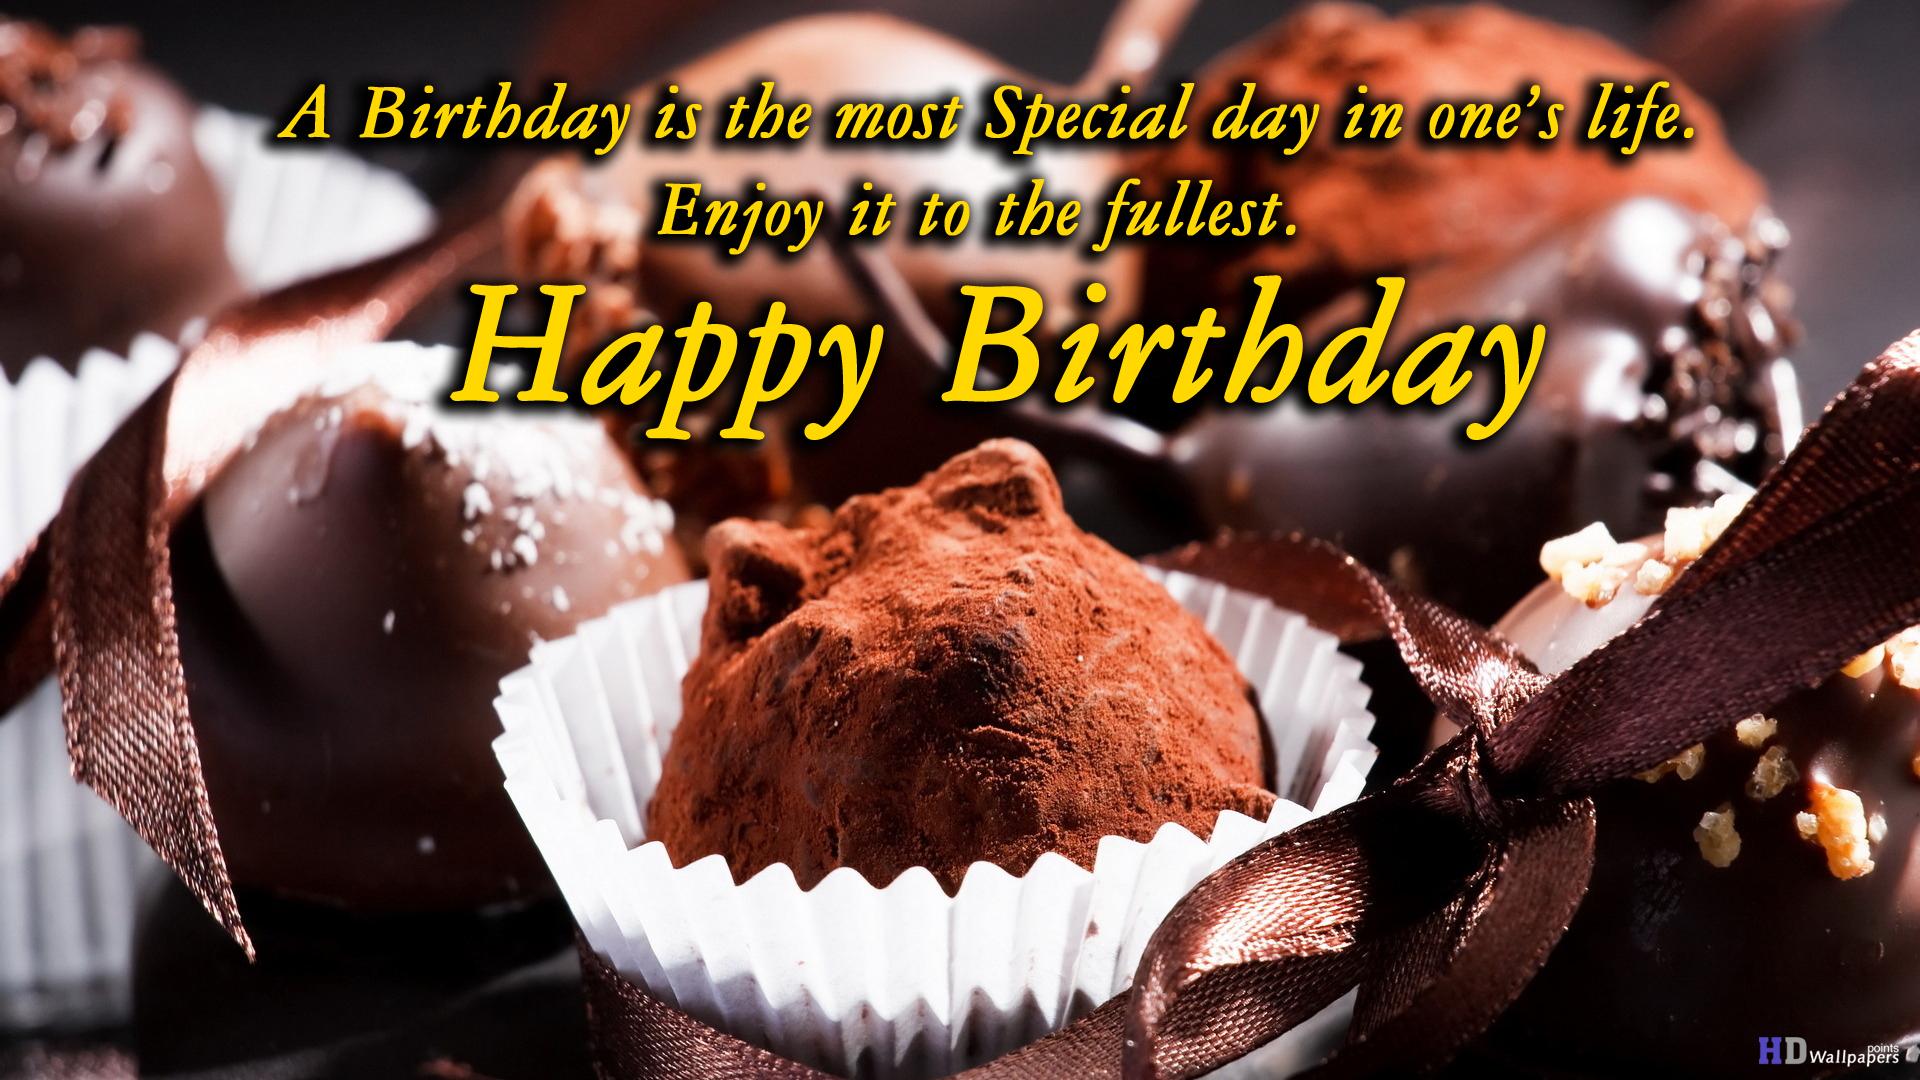 Chocolate Birthday Wishing Cake Desktop HD Wallpaper 1920x1080